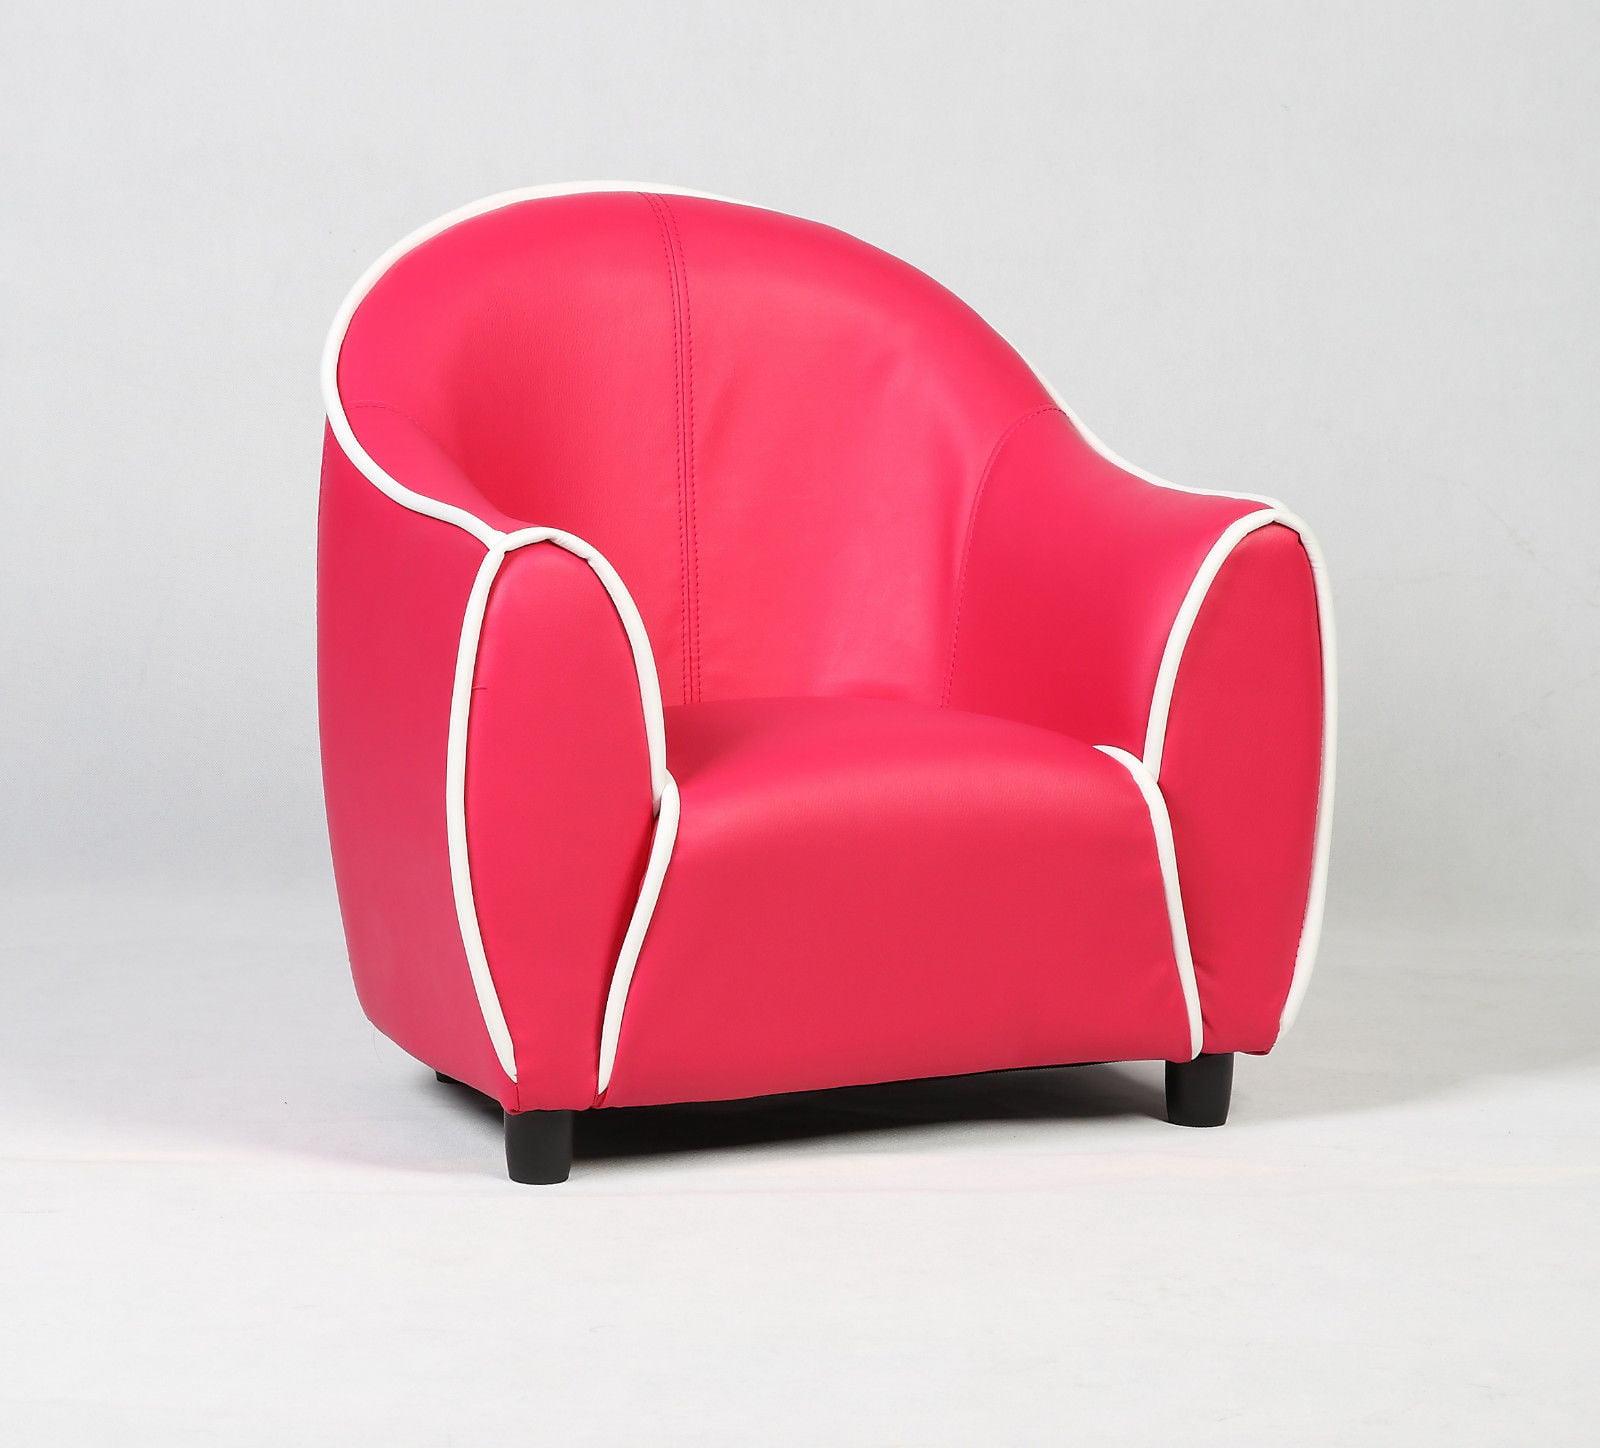 Kids Sofa Armrest Chair Couch Children Living Room Toddler Furniture